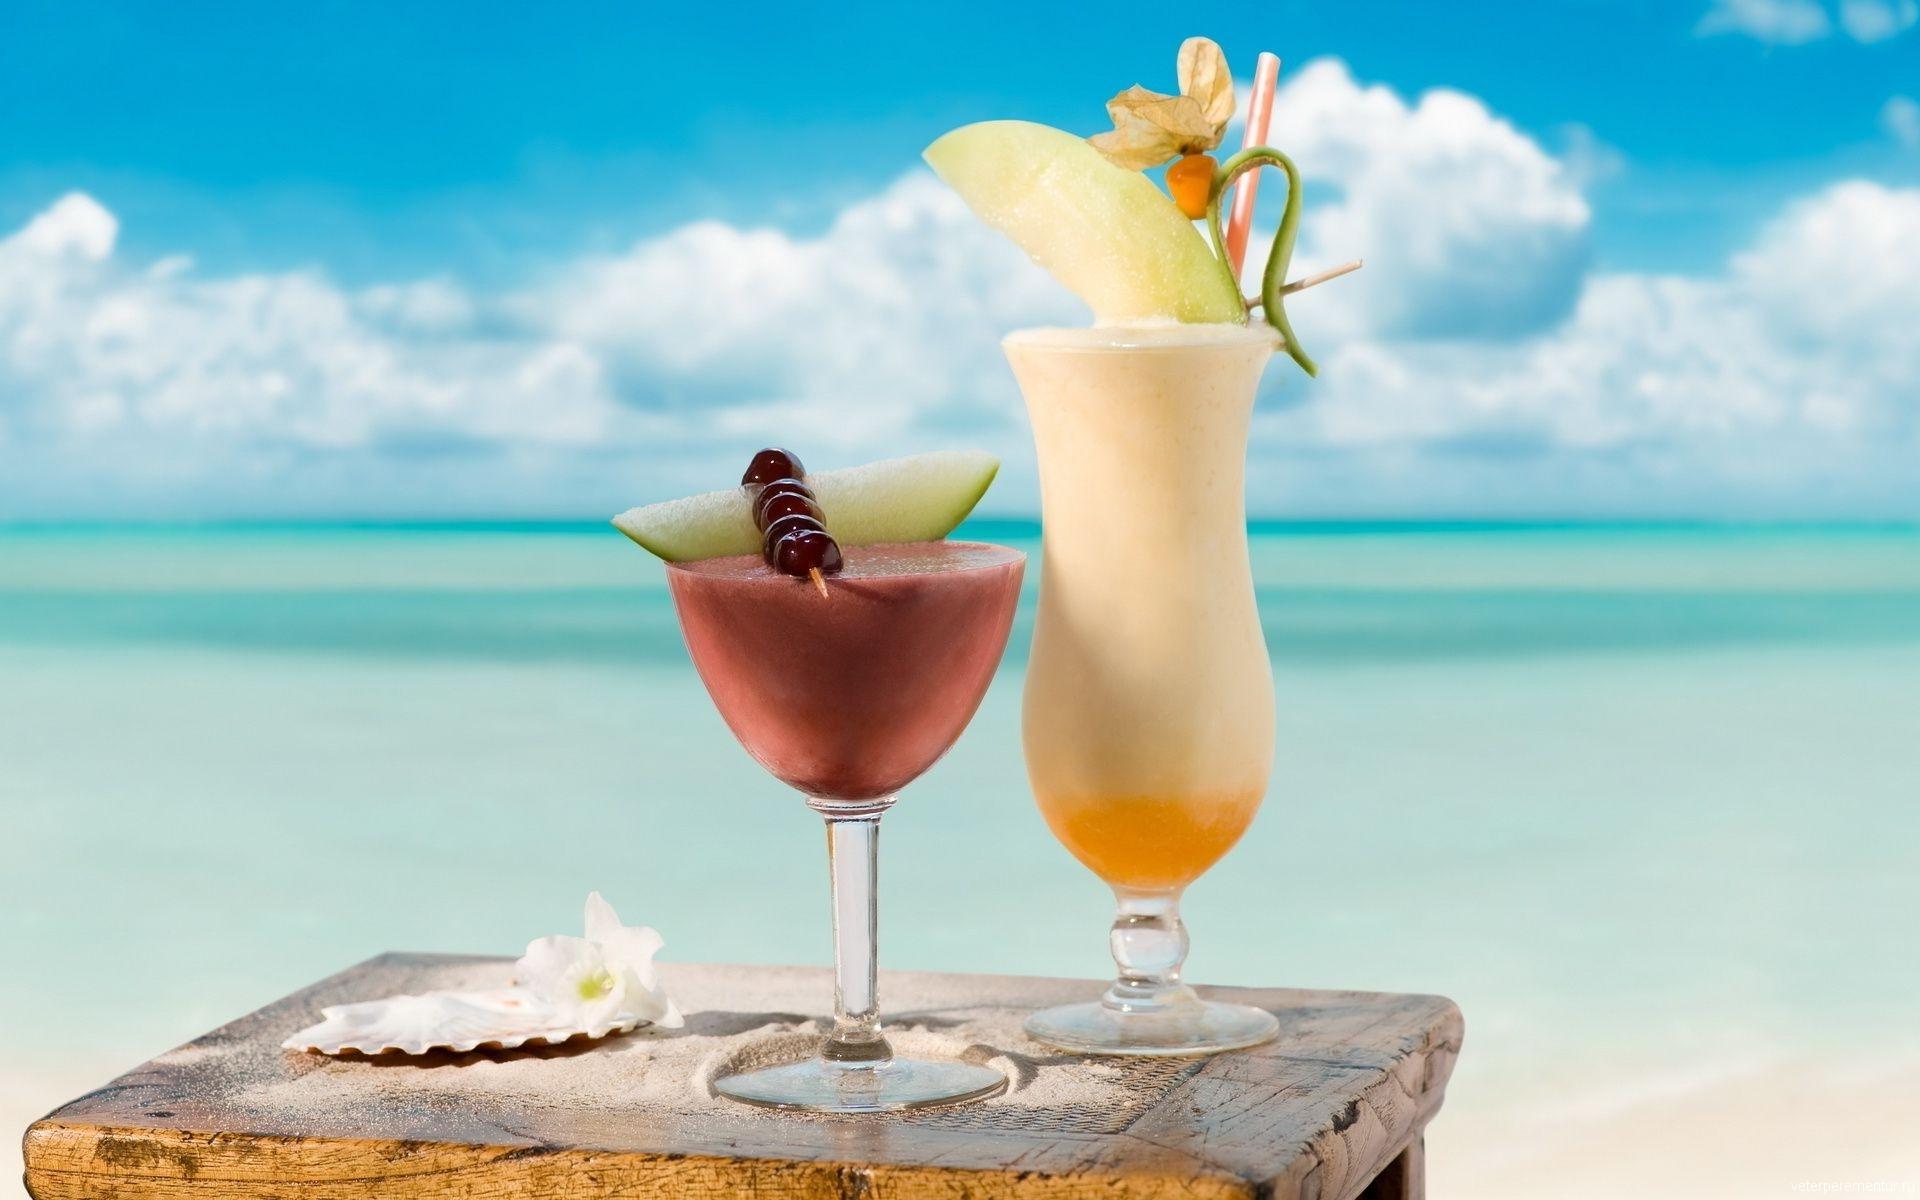 cocktail-koktejl-dynya-more-stakan-napitok-vishnya